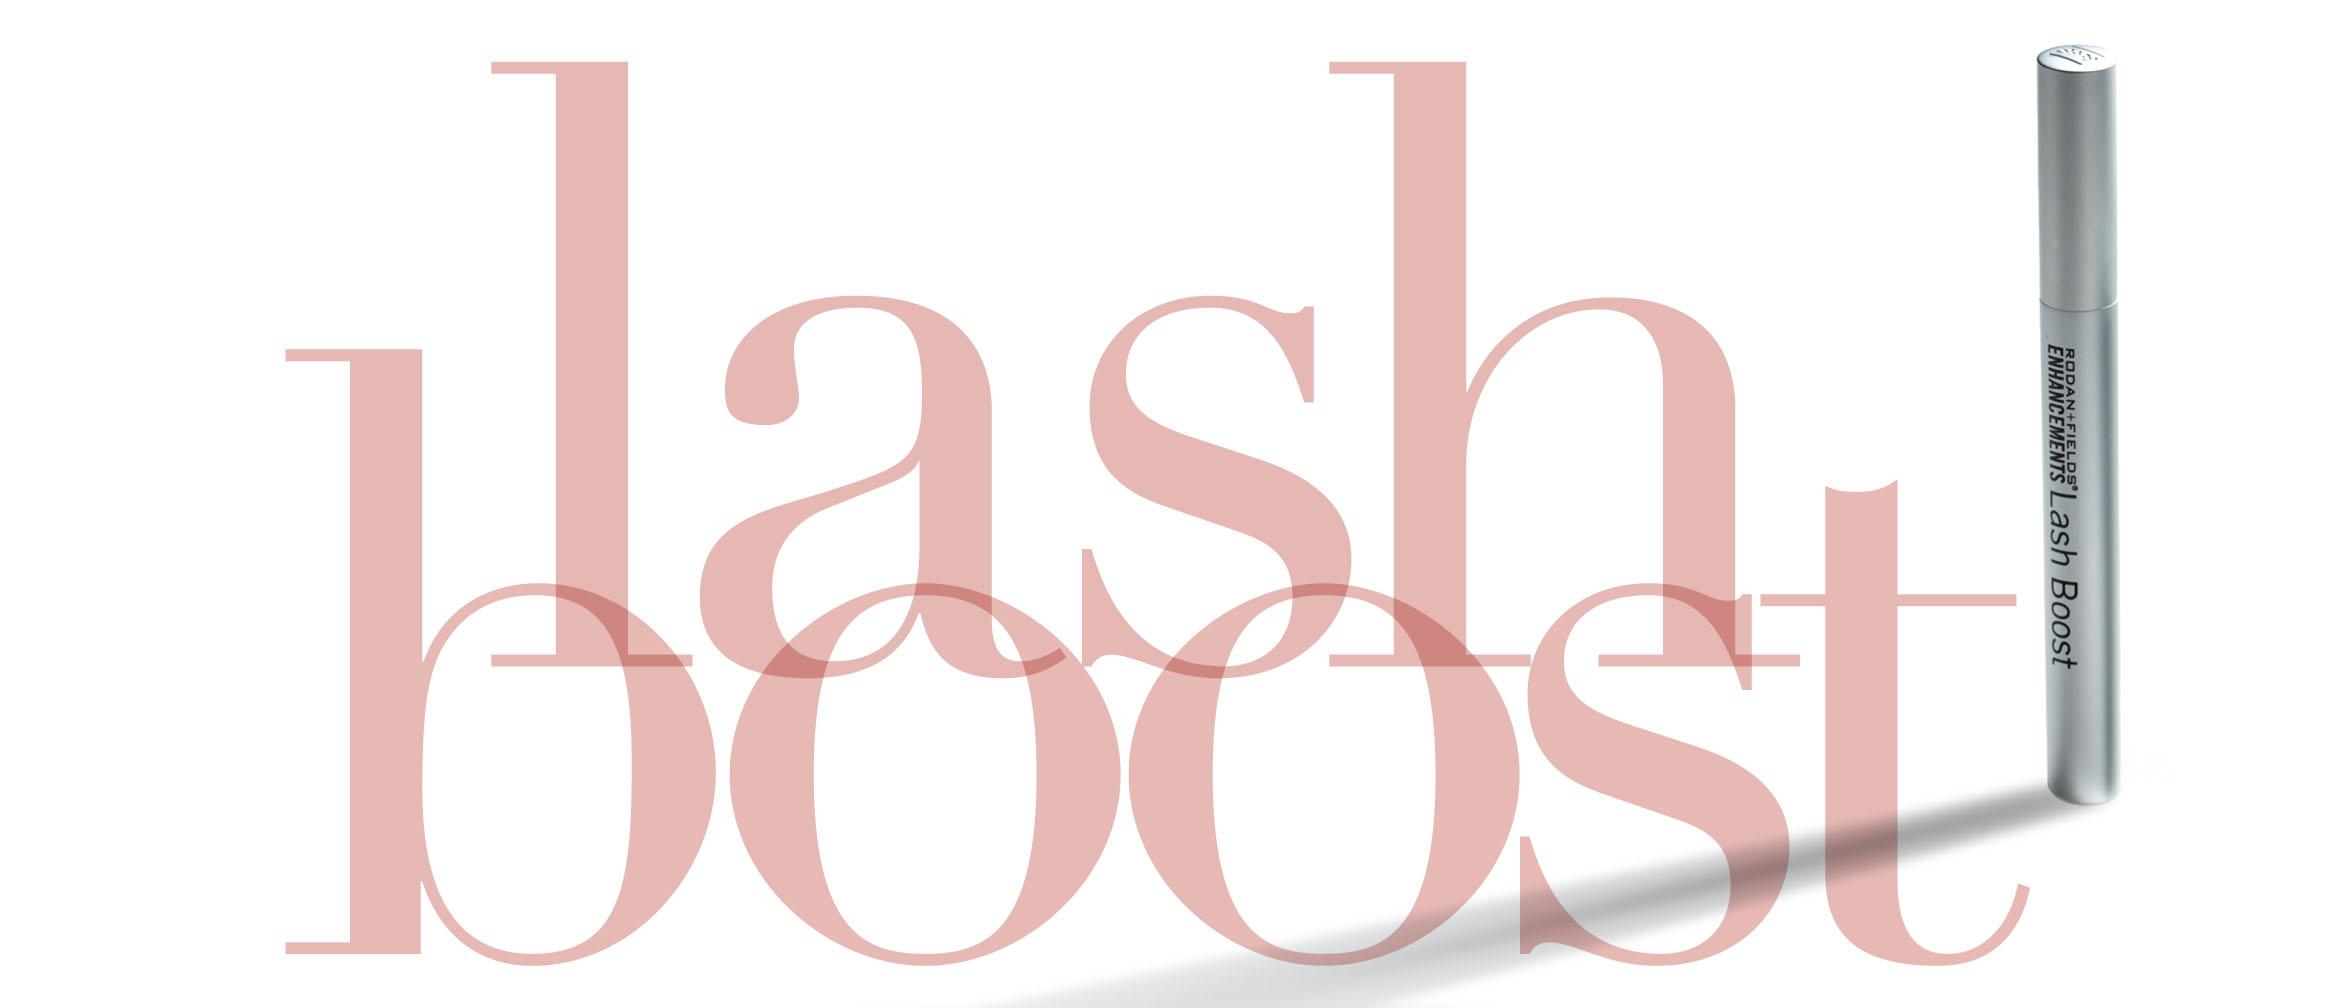 lashboost_title_overlapping_tube.jpg